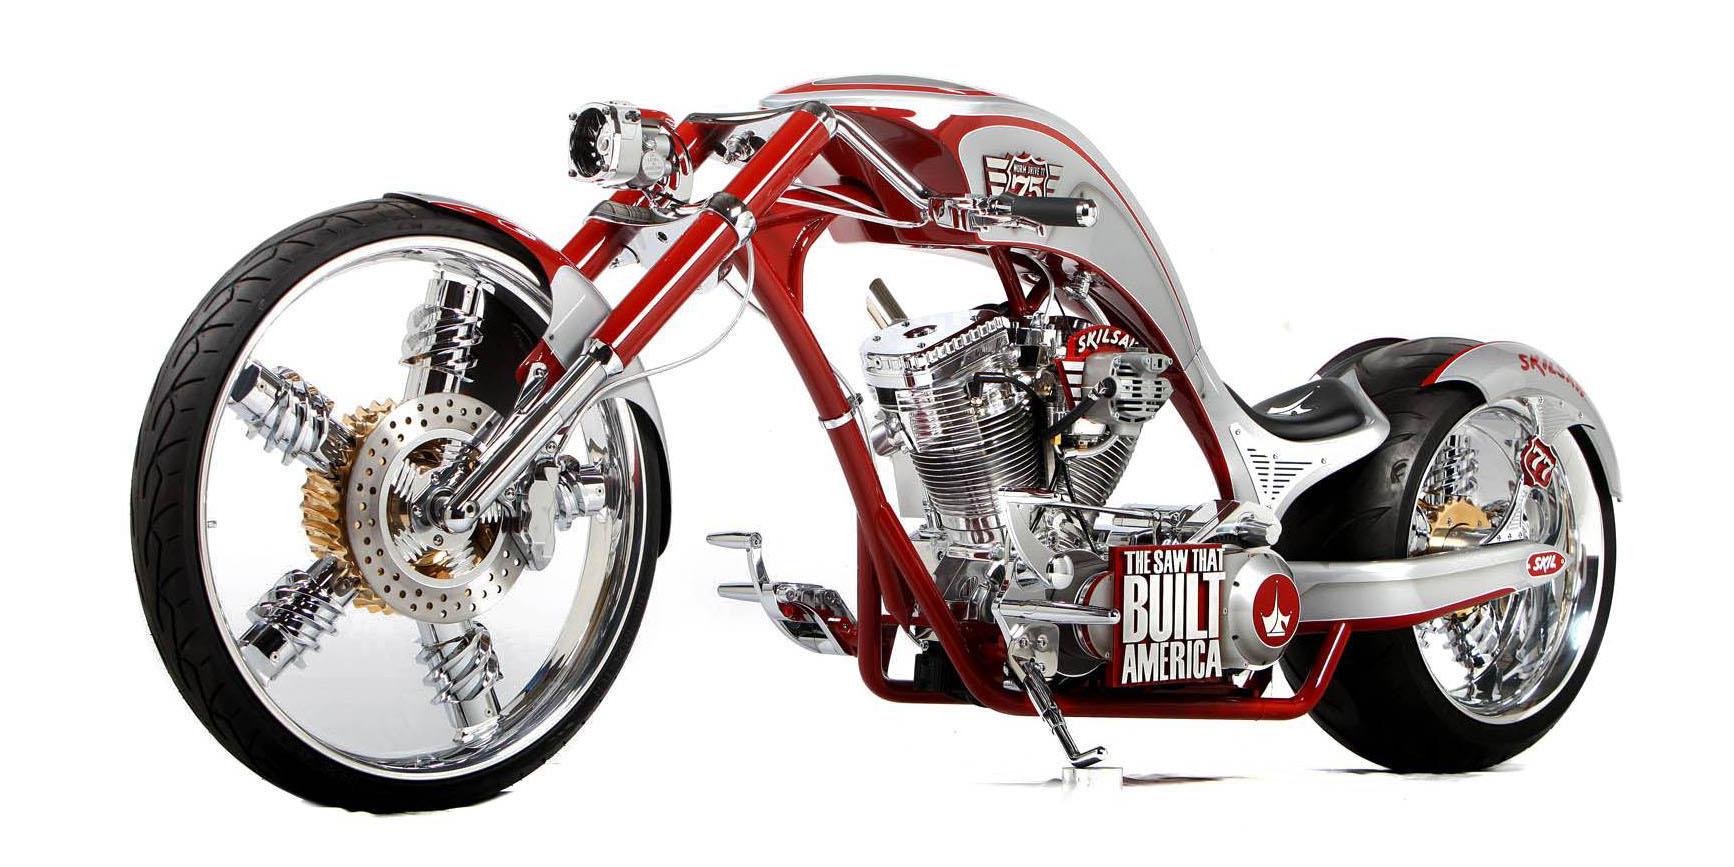 paul-jr-designs-skil-bike-008-e1518208756186